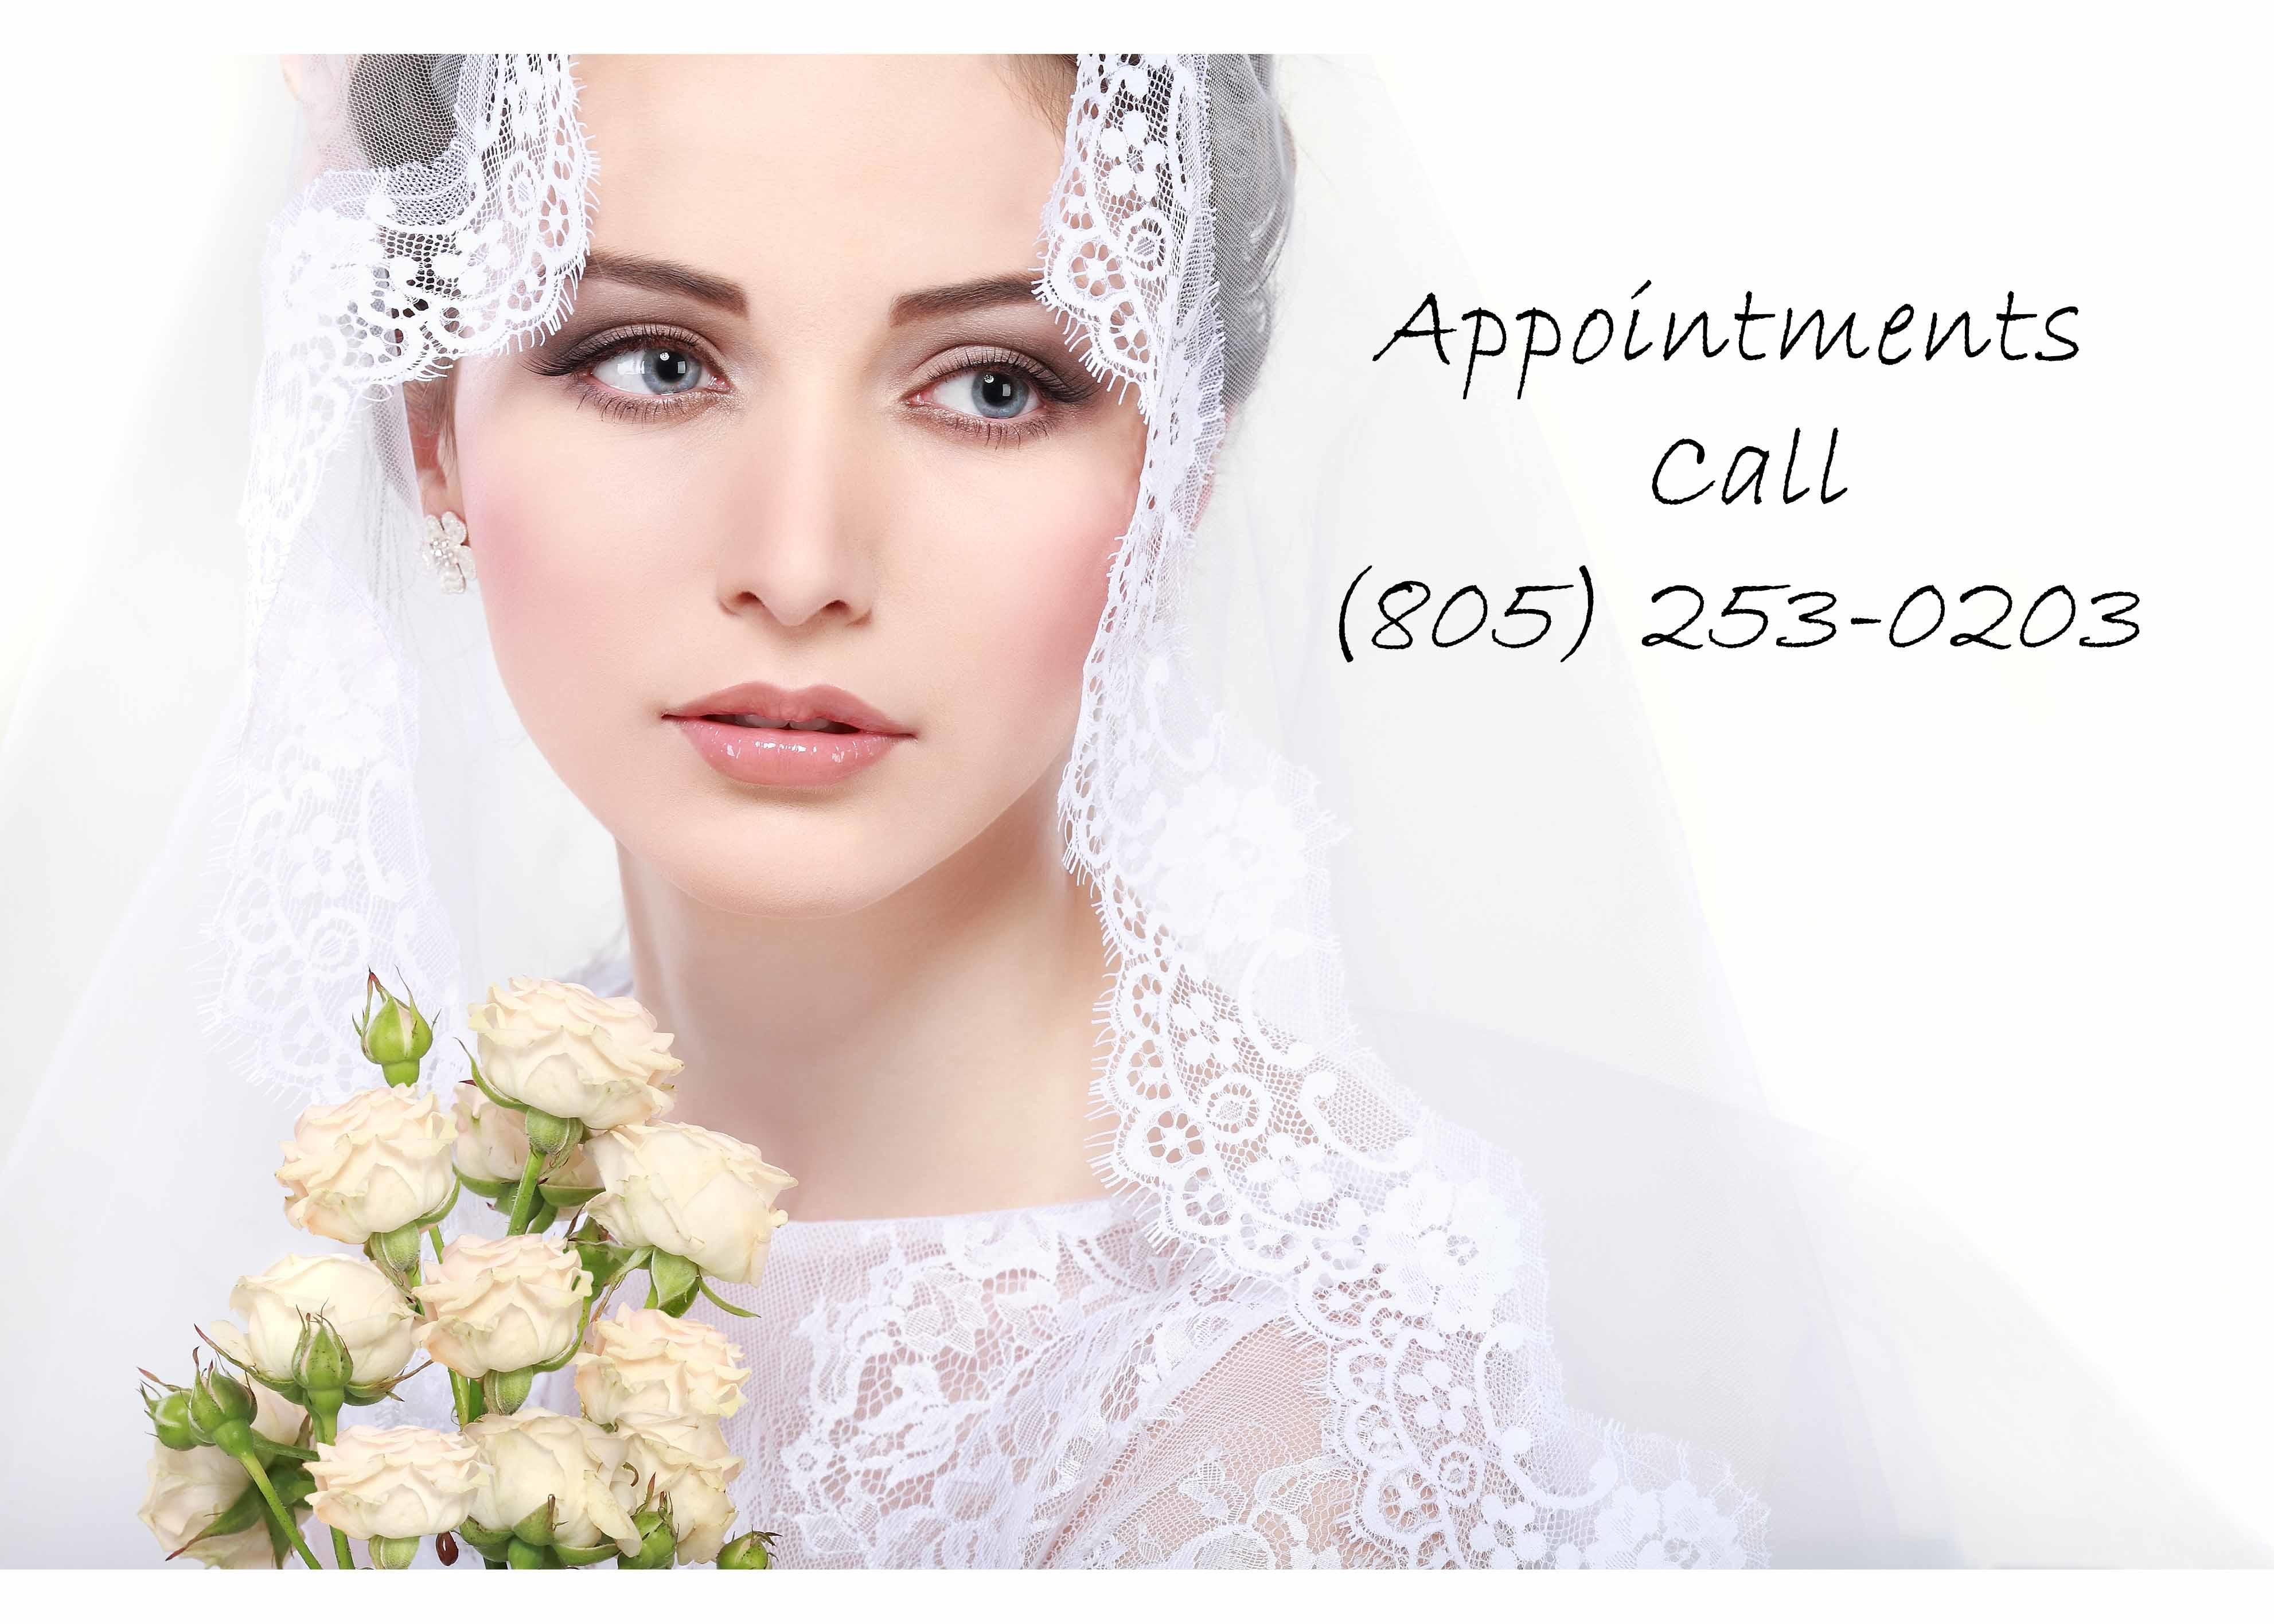 Wäng's Bridal Wedding Gowns, Veils, etc. - Many Styles Under 1100 Dollars